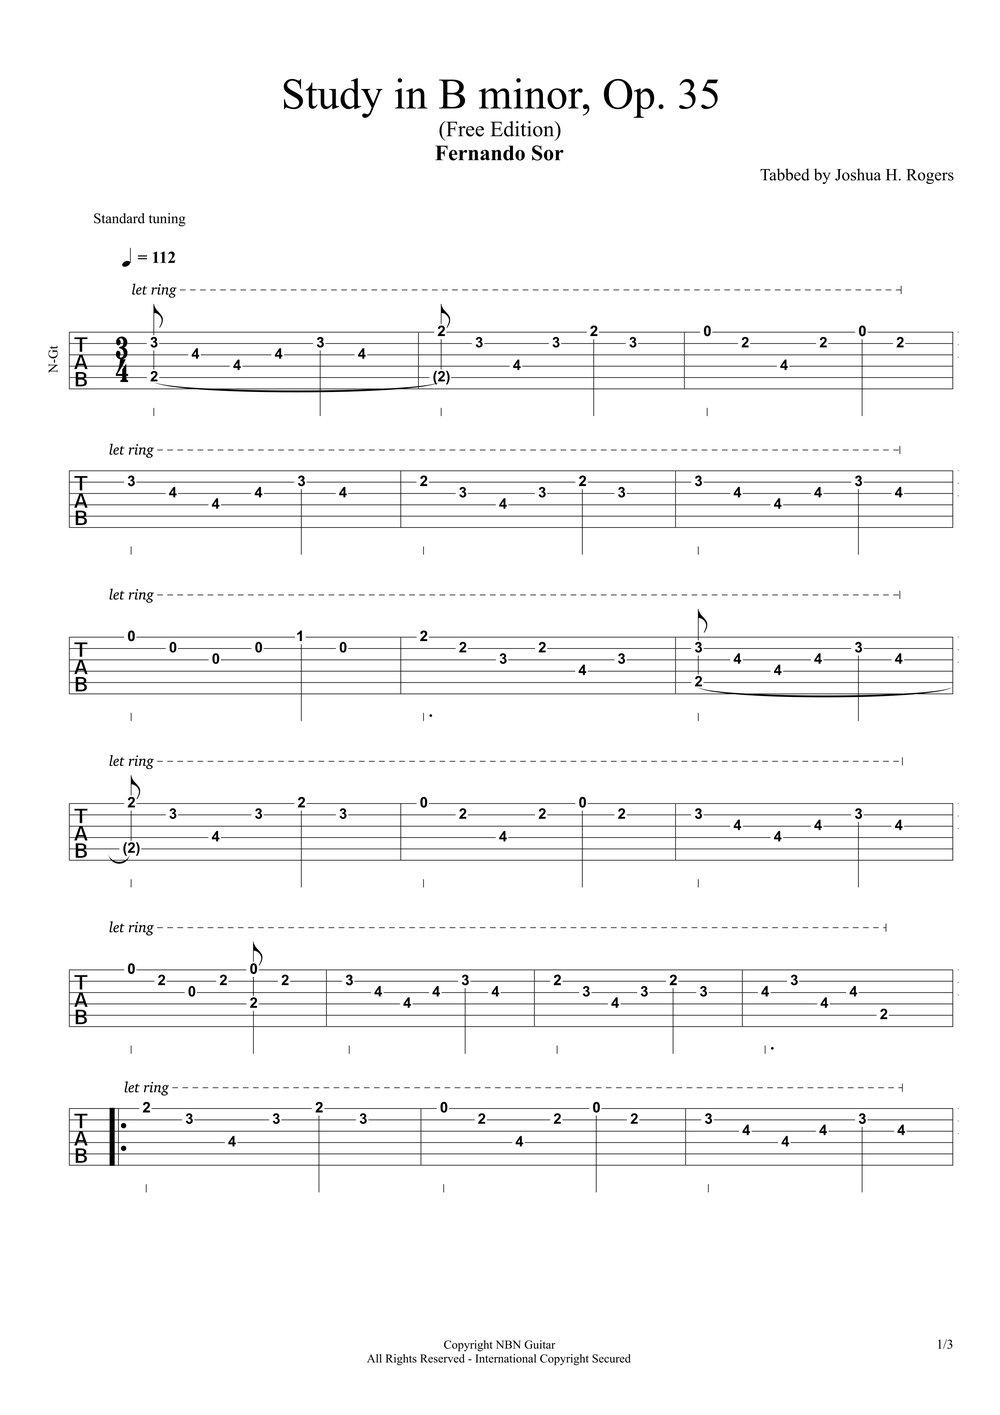 Study in B minor, Op. 35 (Tabs)-p3.jpg